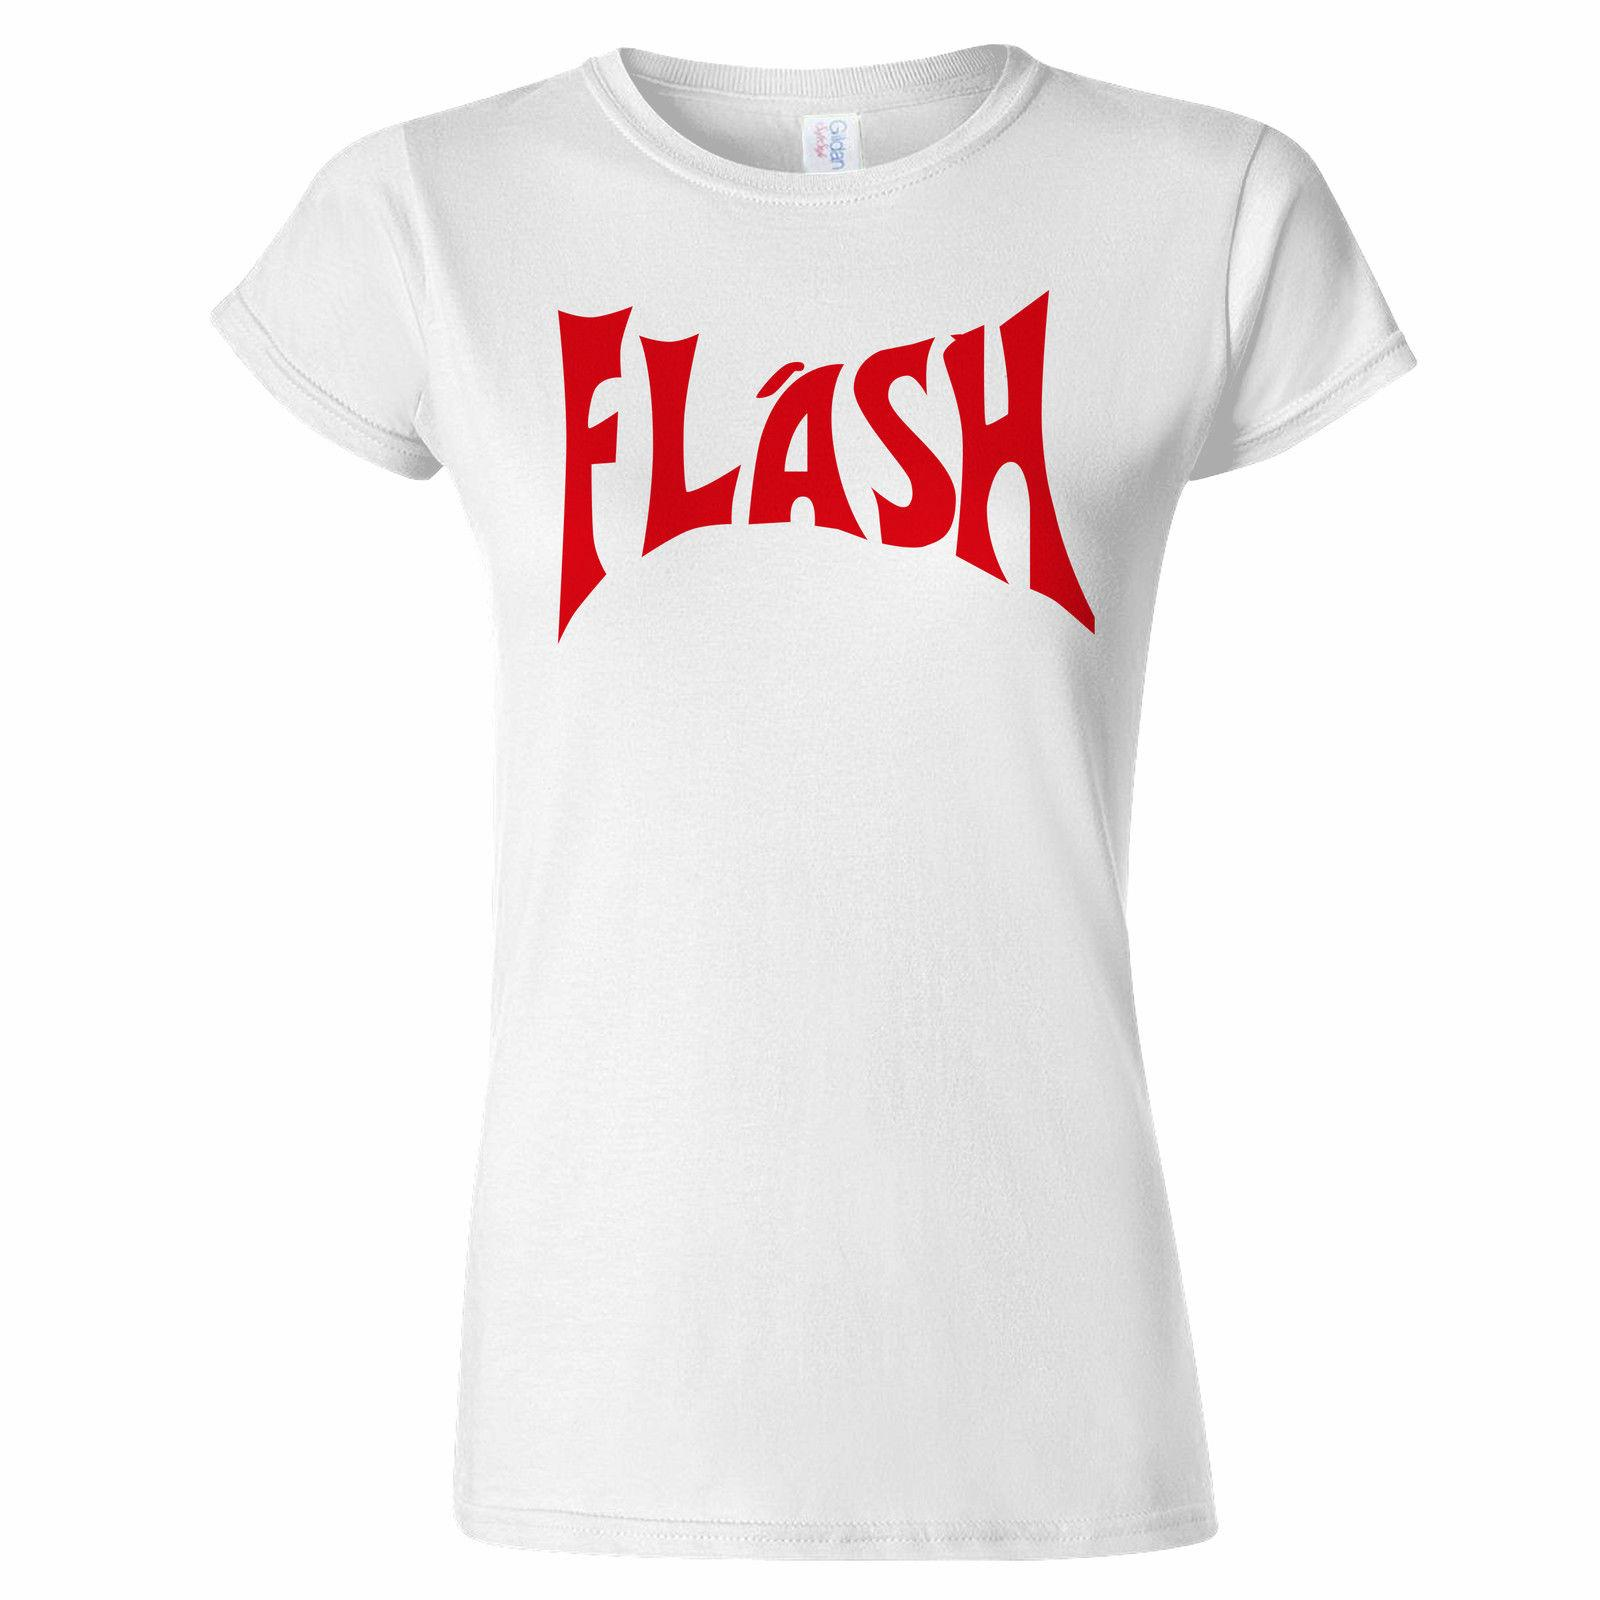 e9a5f9793ea Women S Tee Flash Queen T Shirt Gordon As Worn By Freddie Mercury Crazy  Female T Shirt Women T Shirt Short Funny Tees Crew Neck Top Tee T Shirt T  Tee Shirts ...